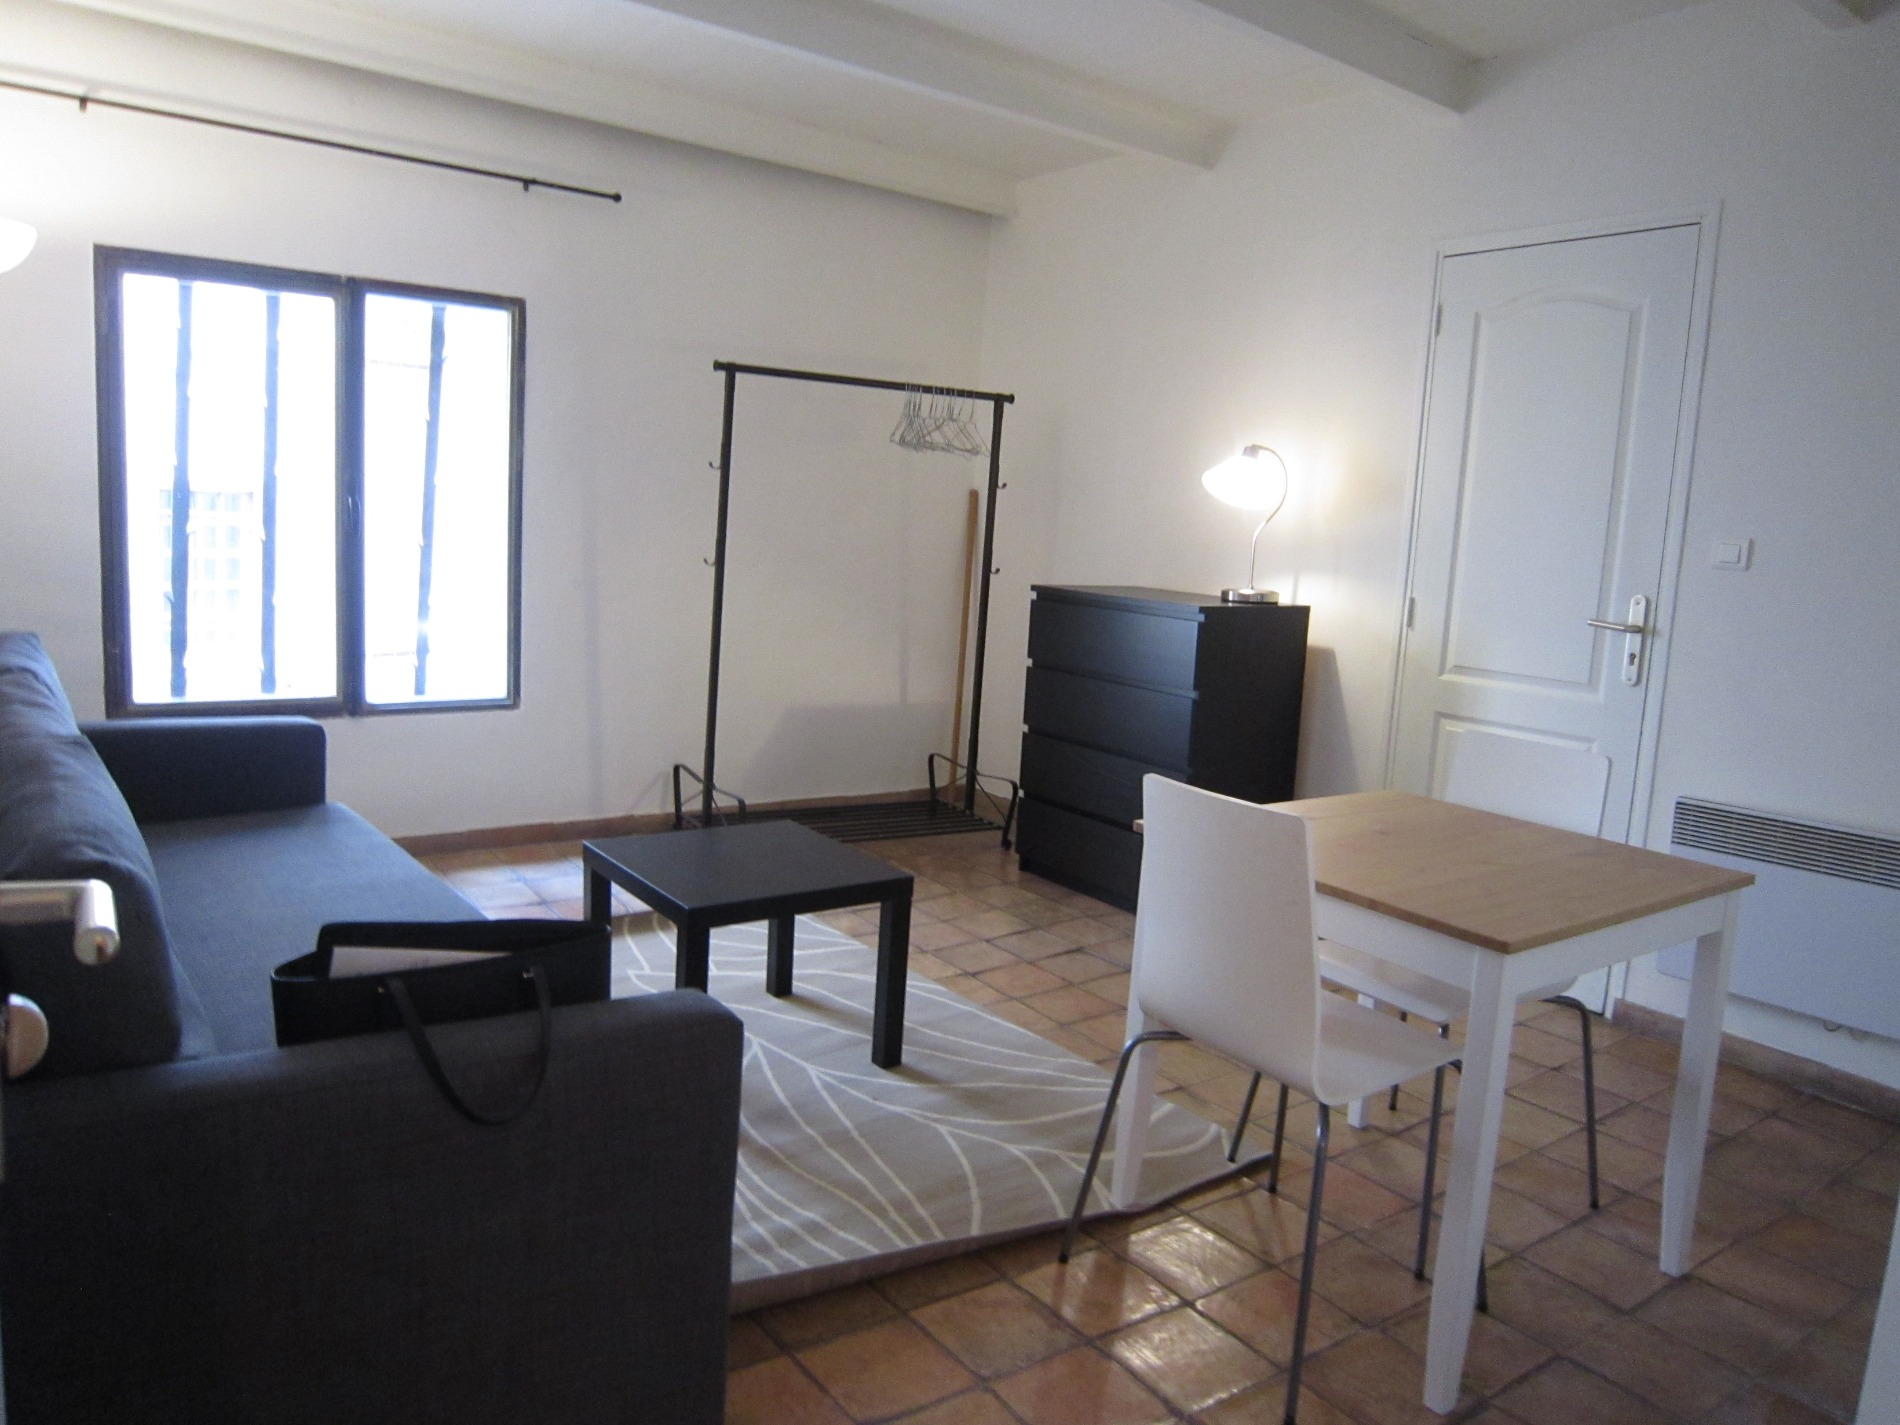 location location studio meubl aix en provence centre ville id al tudiant. Black Bedroom Furniture Sets. Home Design Ideas